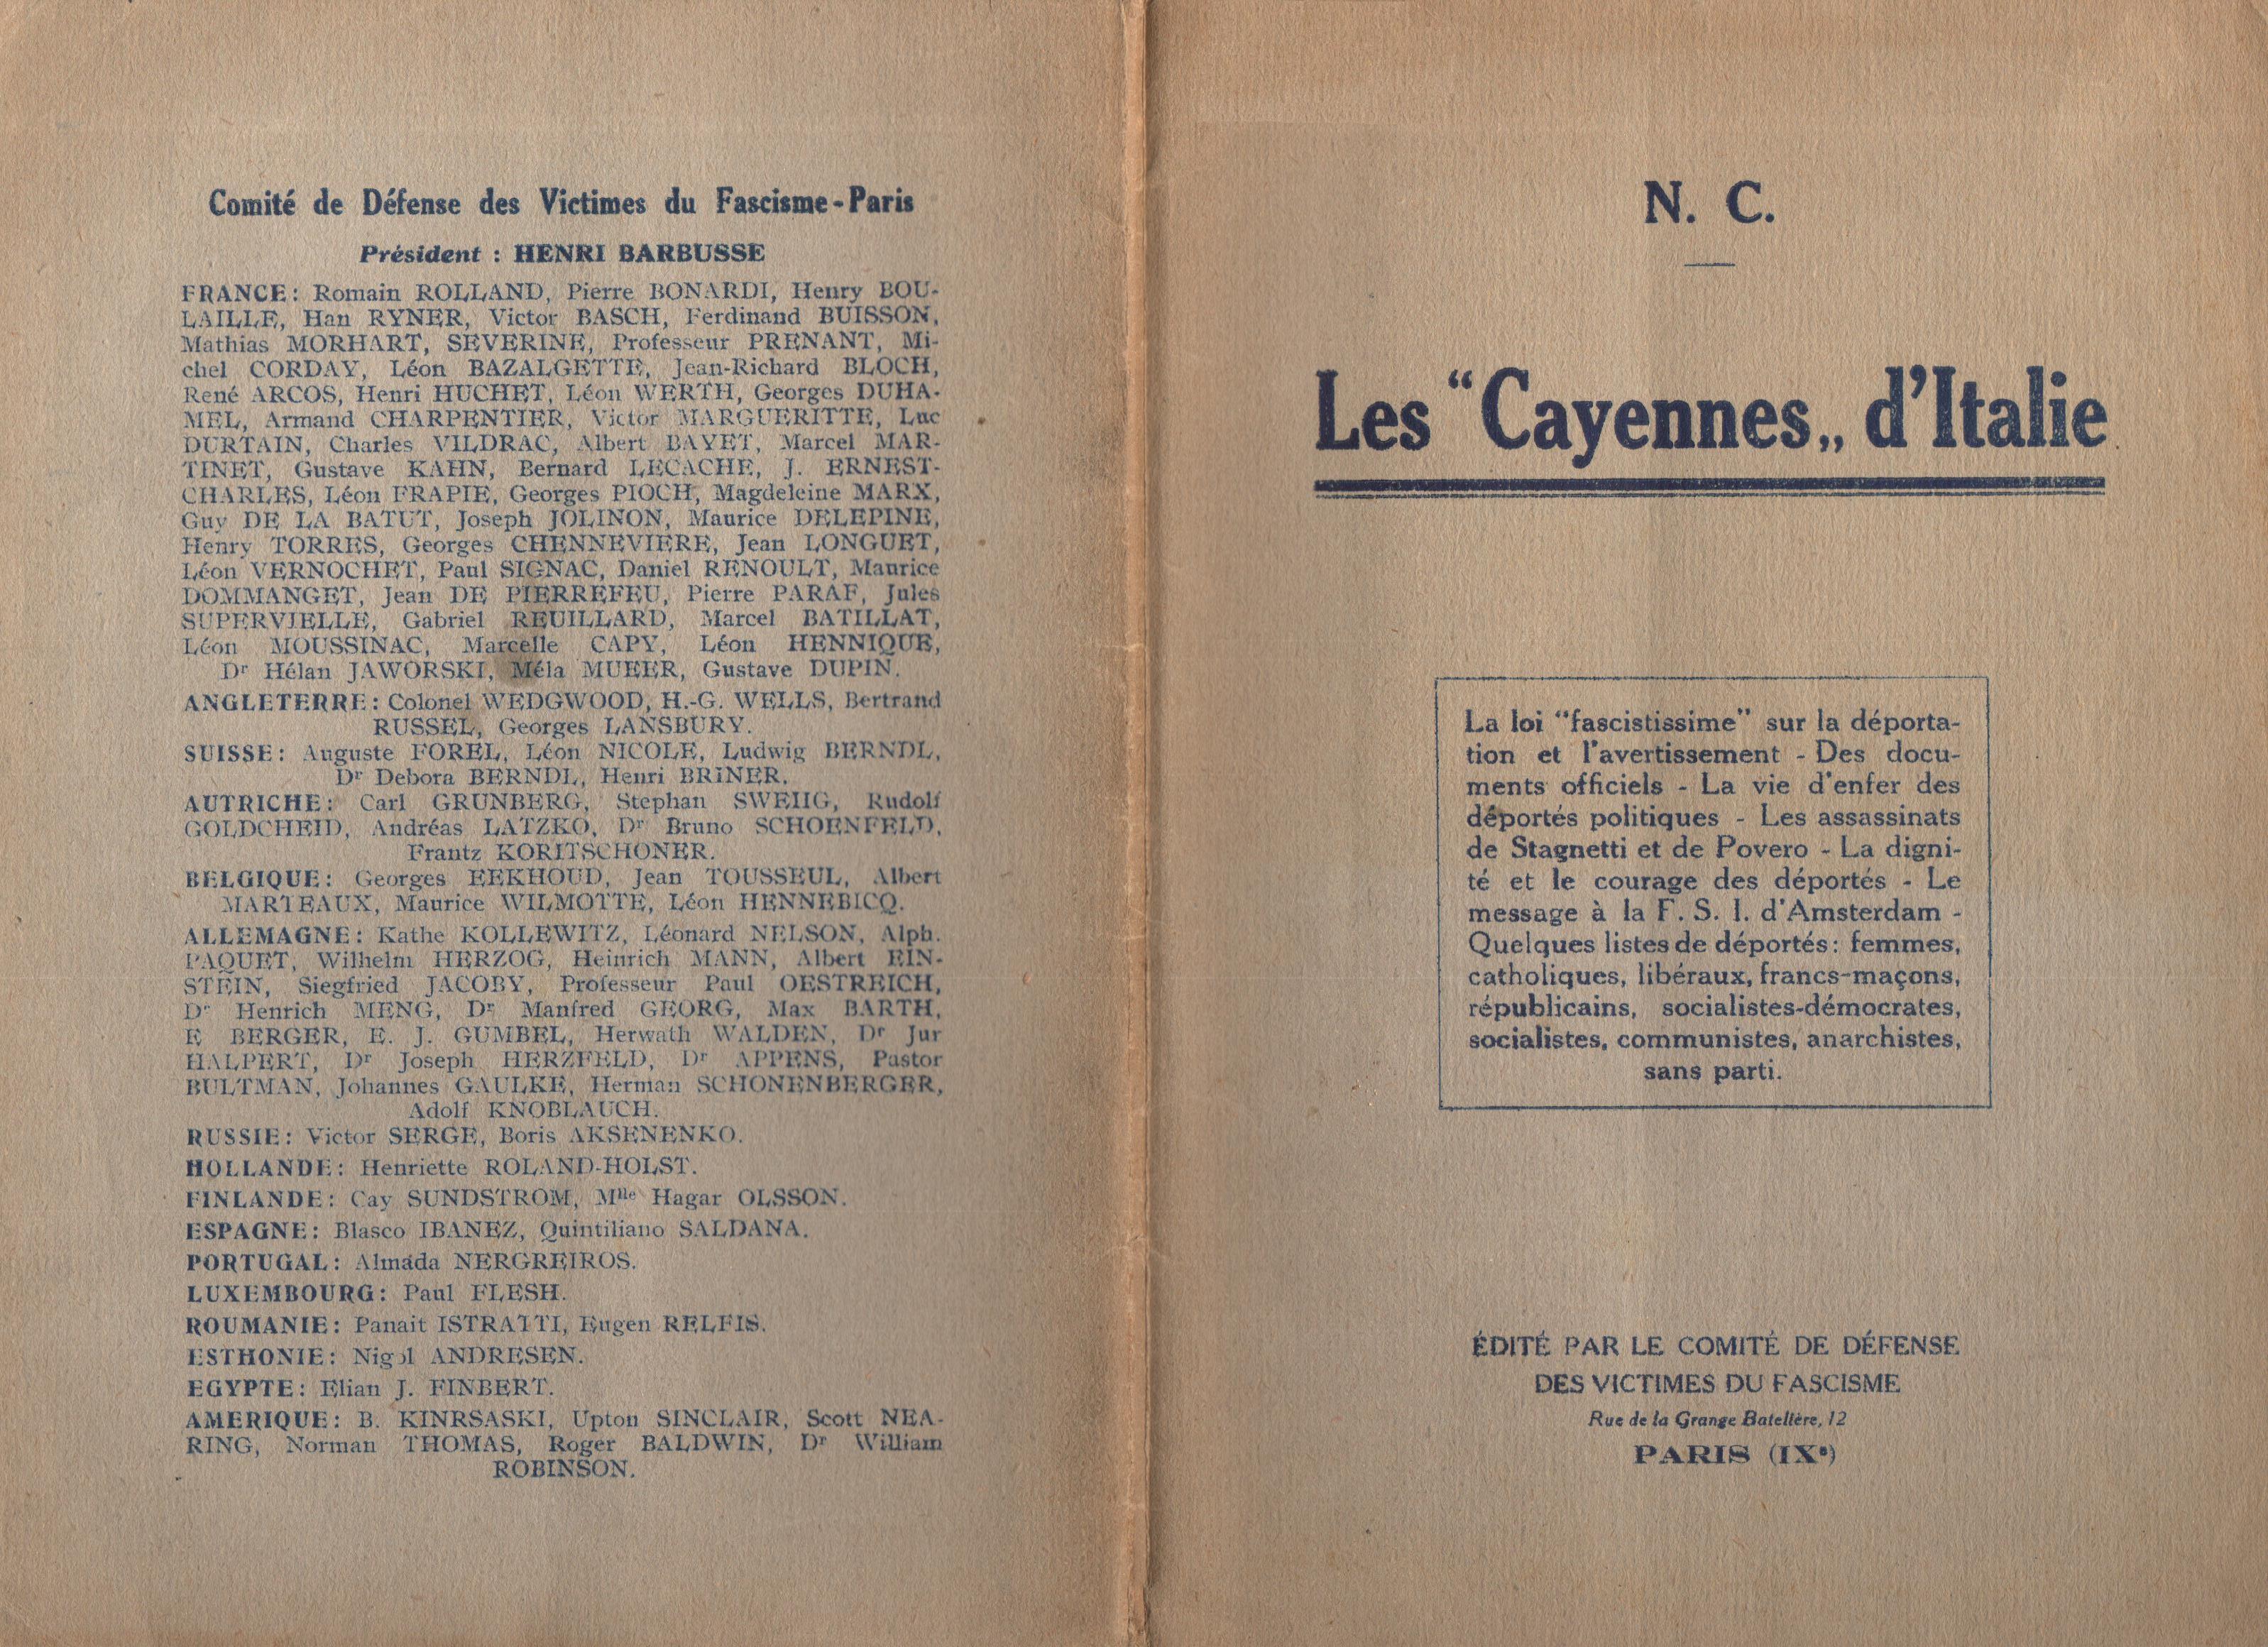 Nicola Cilla, Les «Cayennes» d'Italie - pag. 1